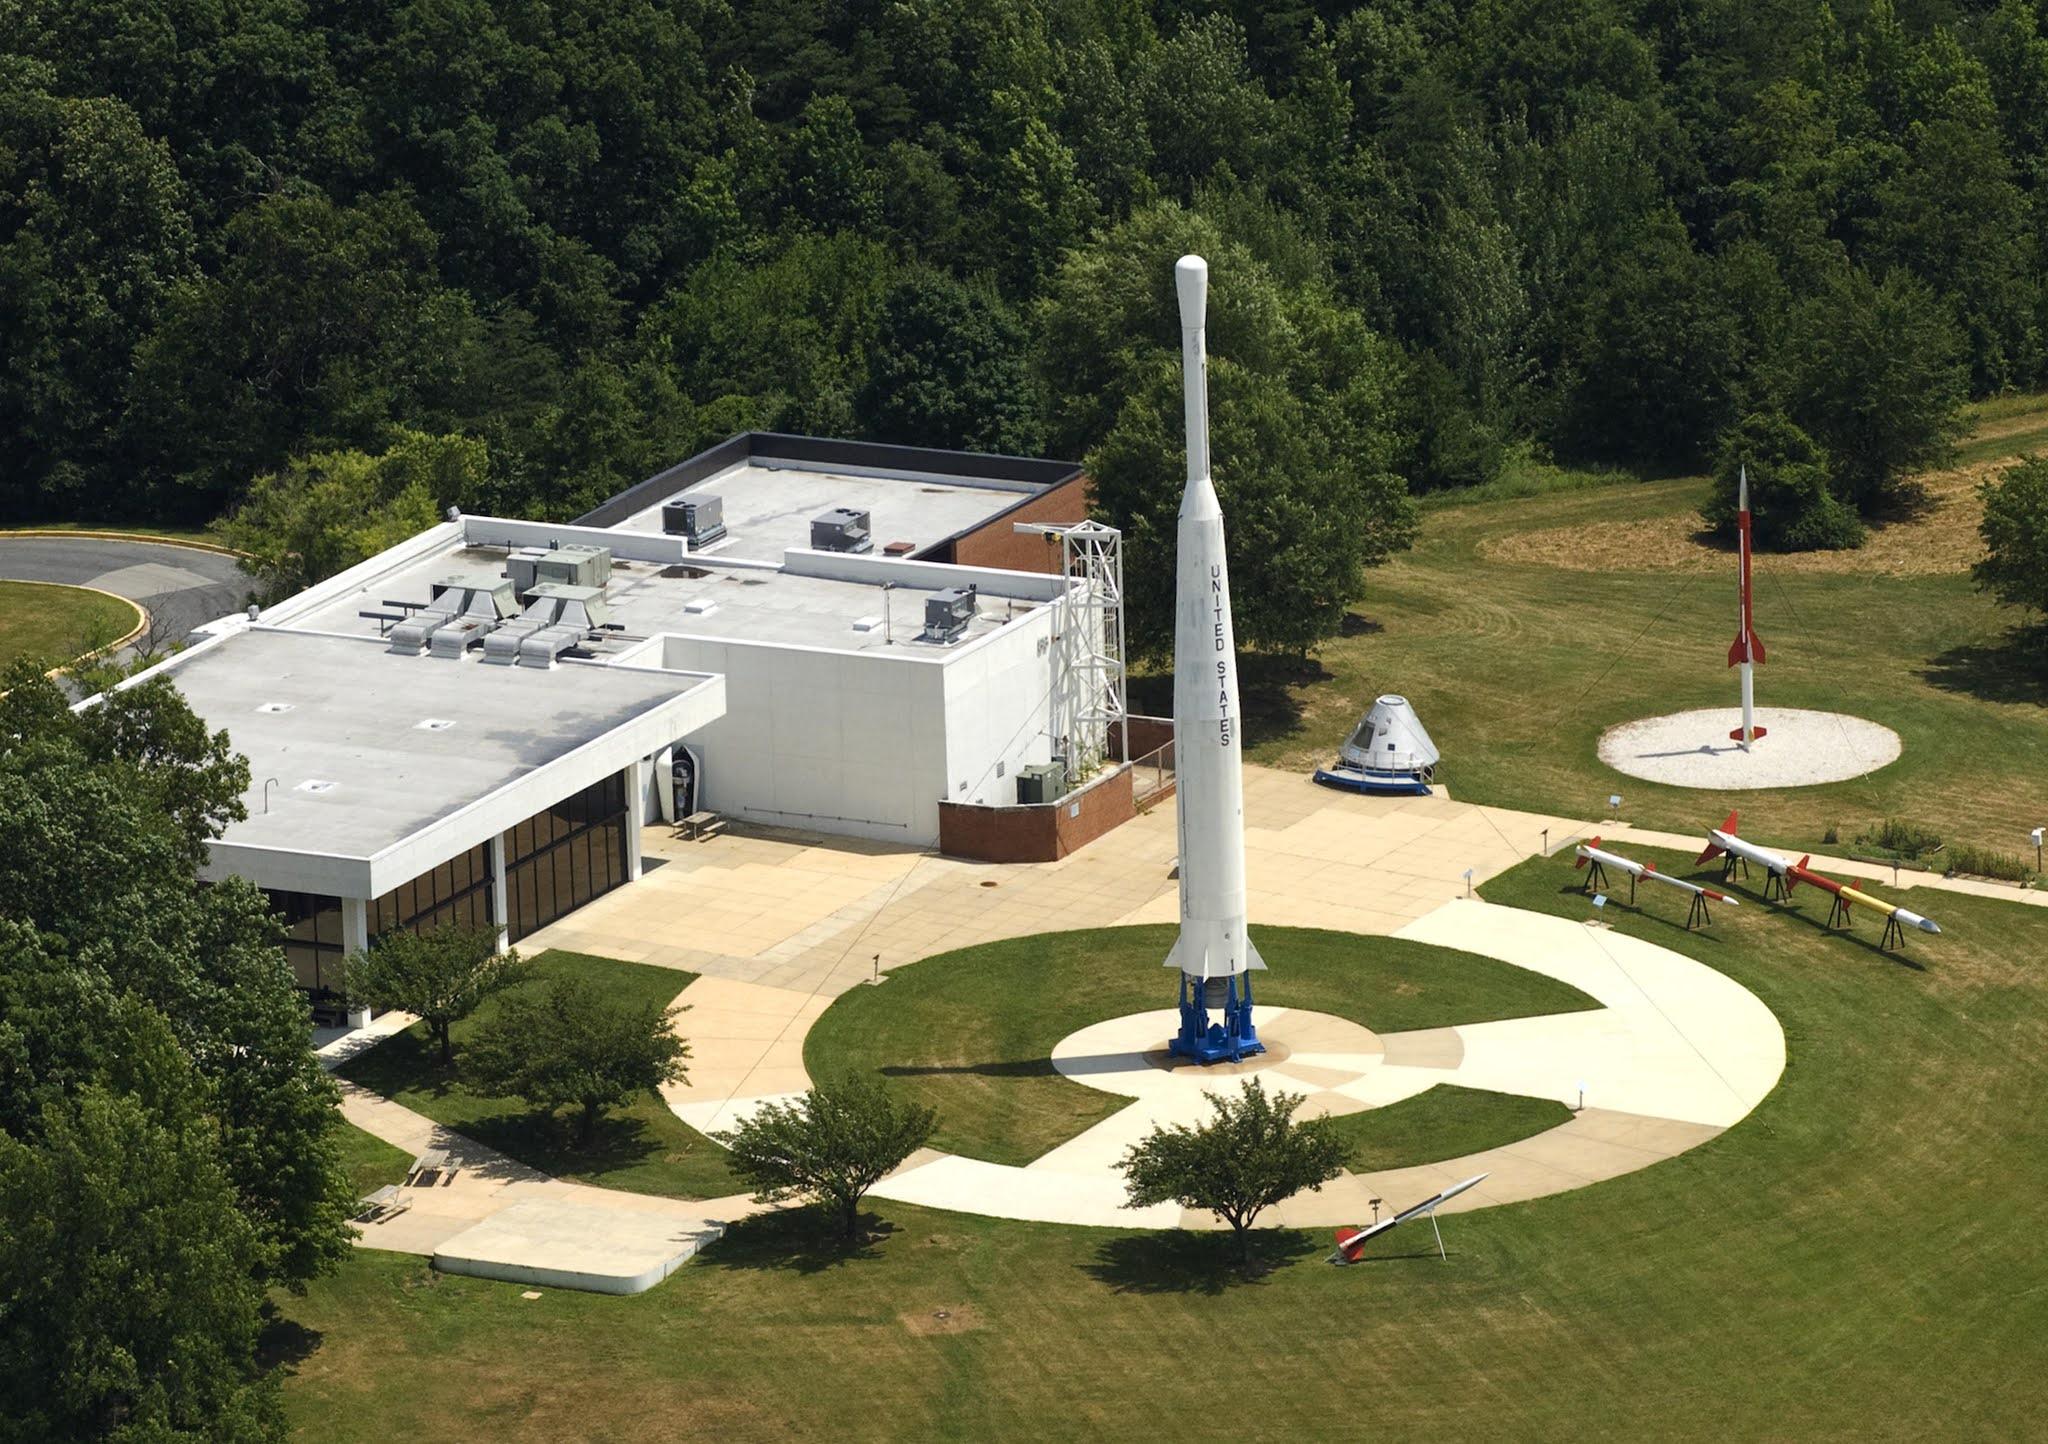 NASA Goddard Visitor Center Offering Free Virtual Field Trips This Summer